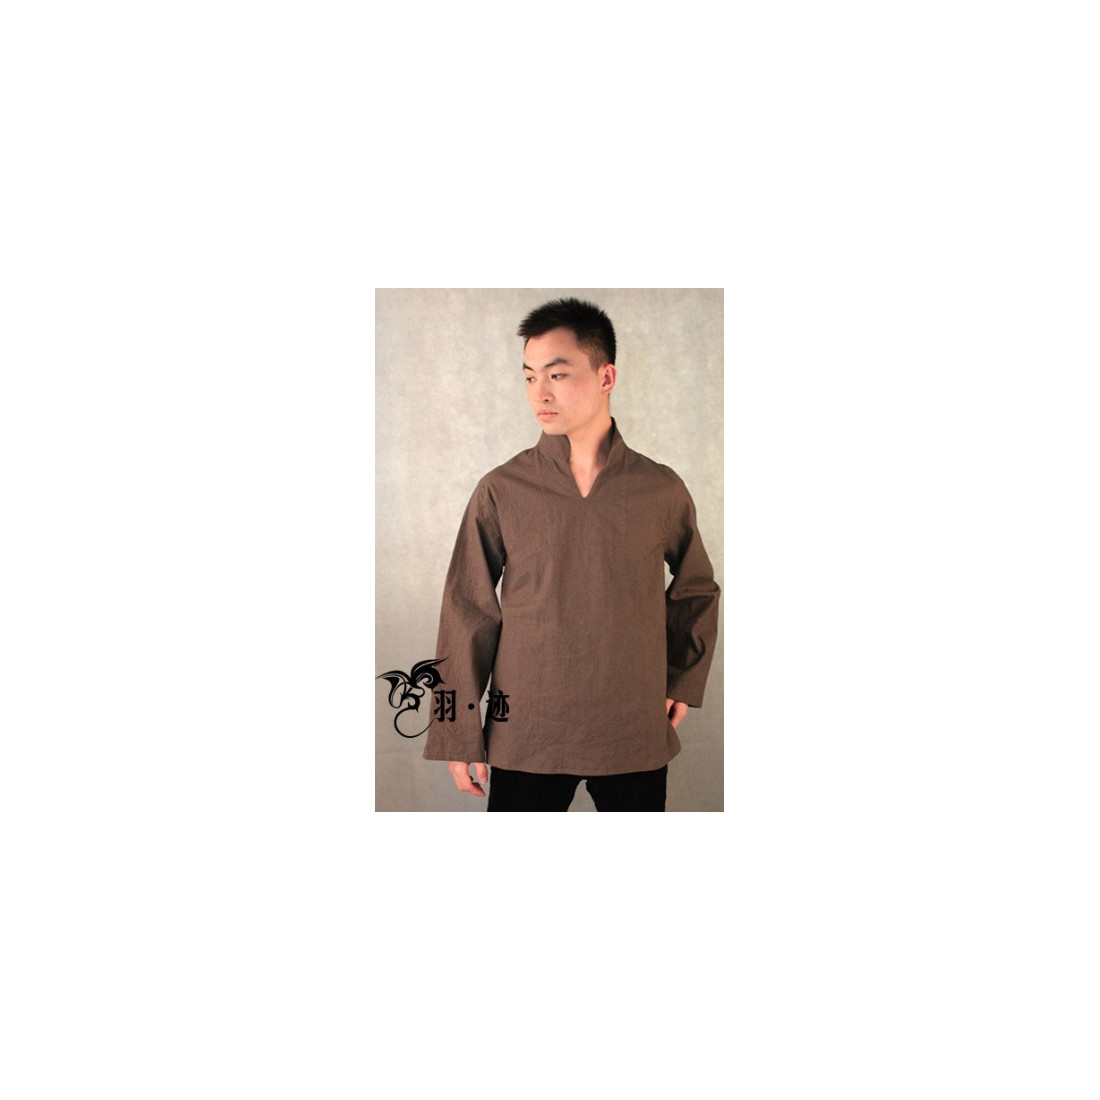 Серо-коричневая рубашка (М106 Билочунь)